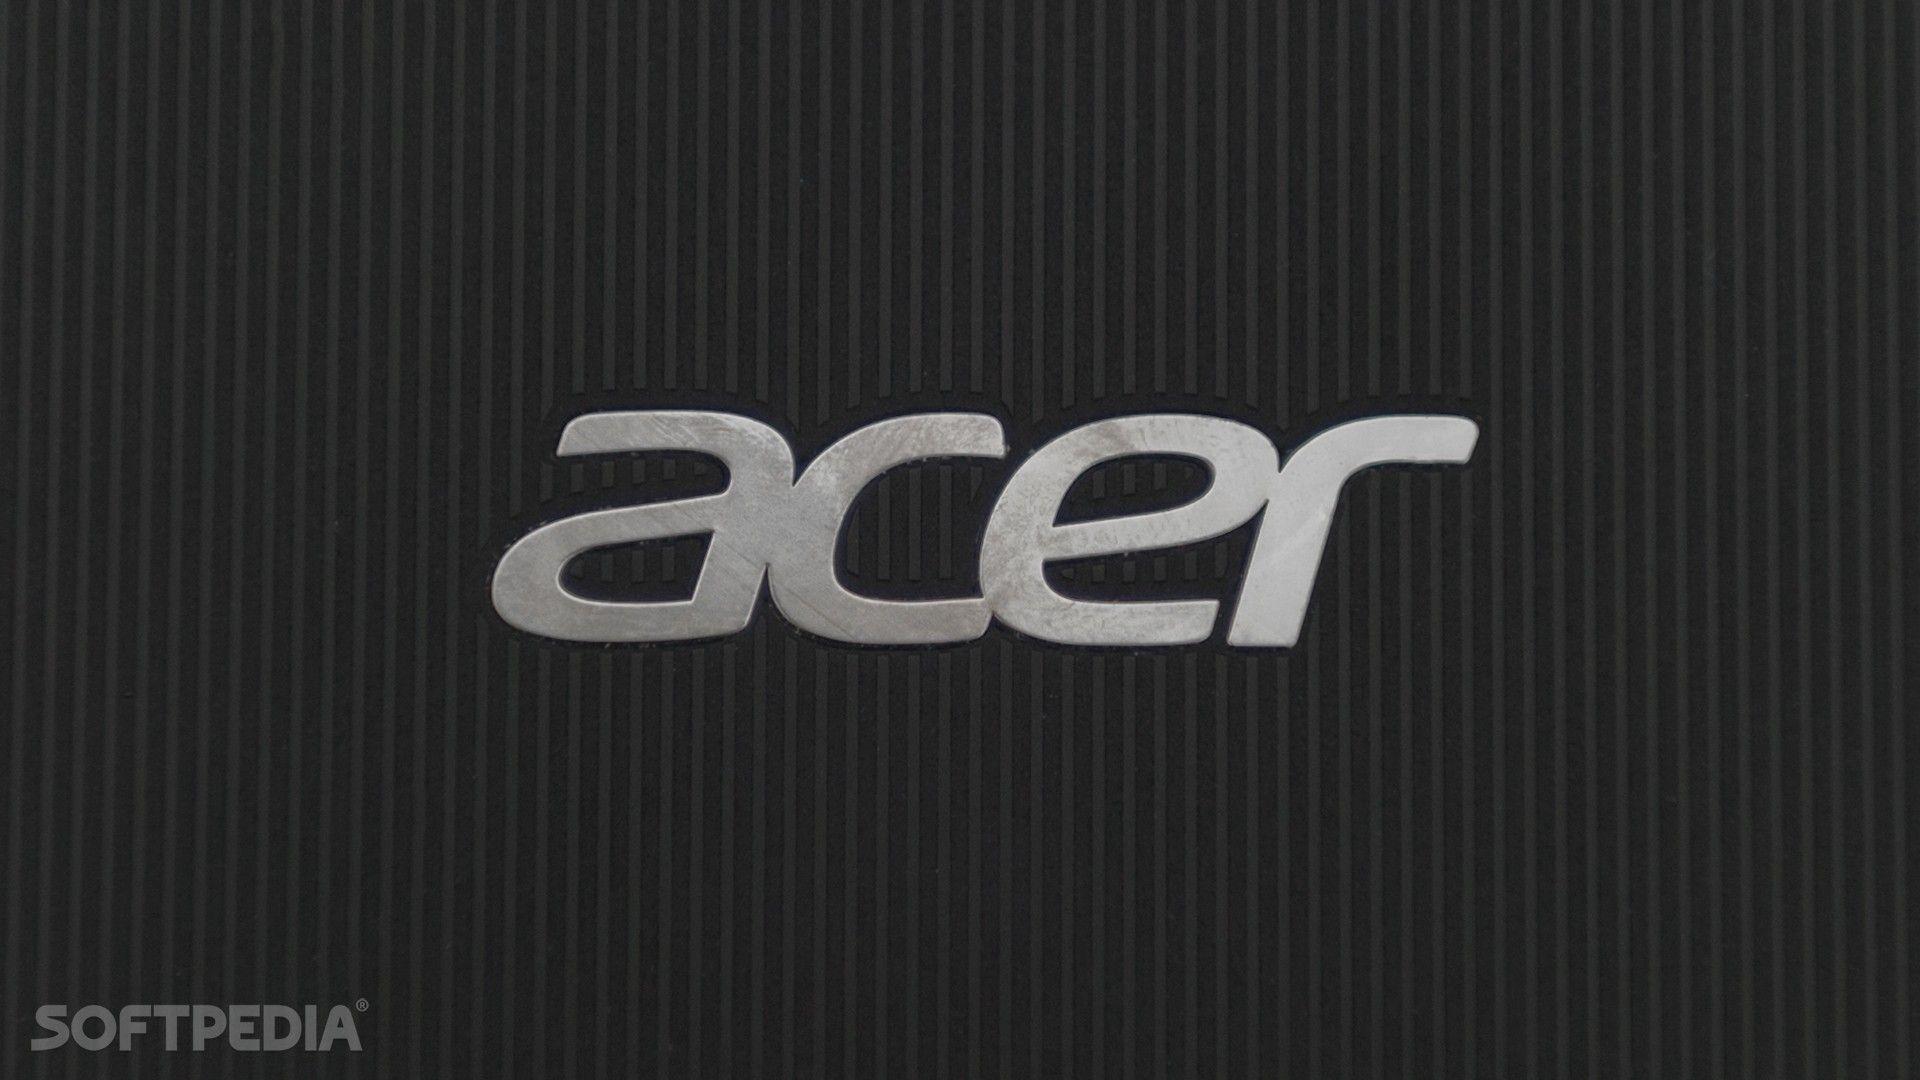 Acer background image